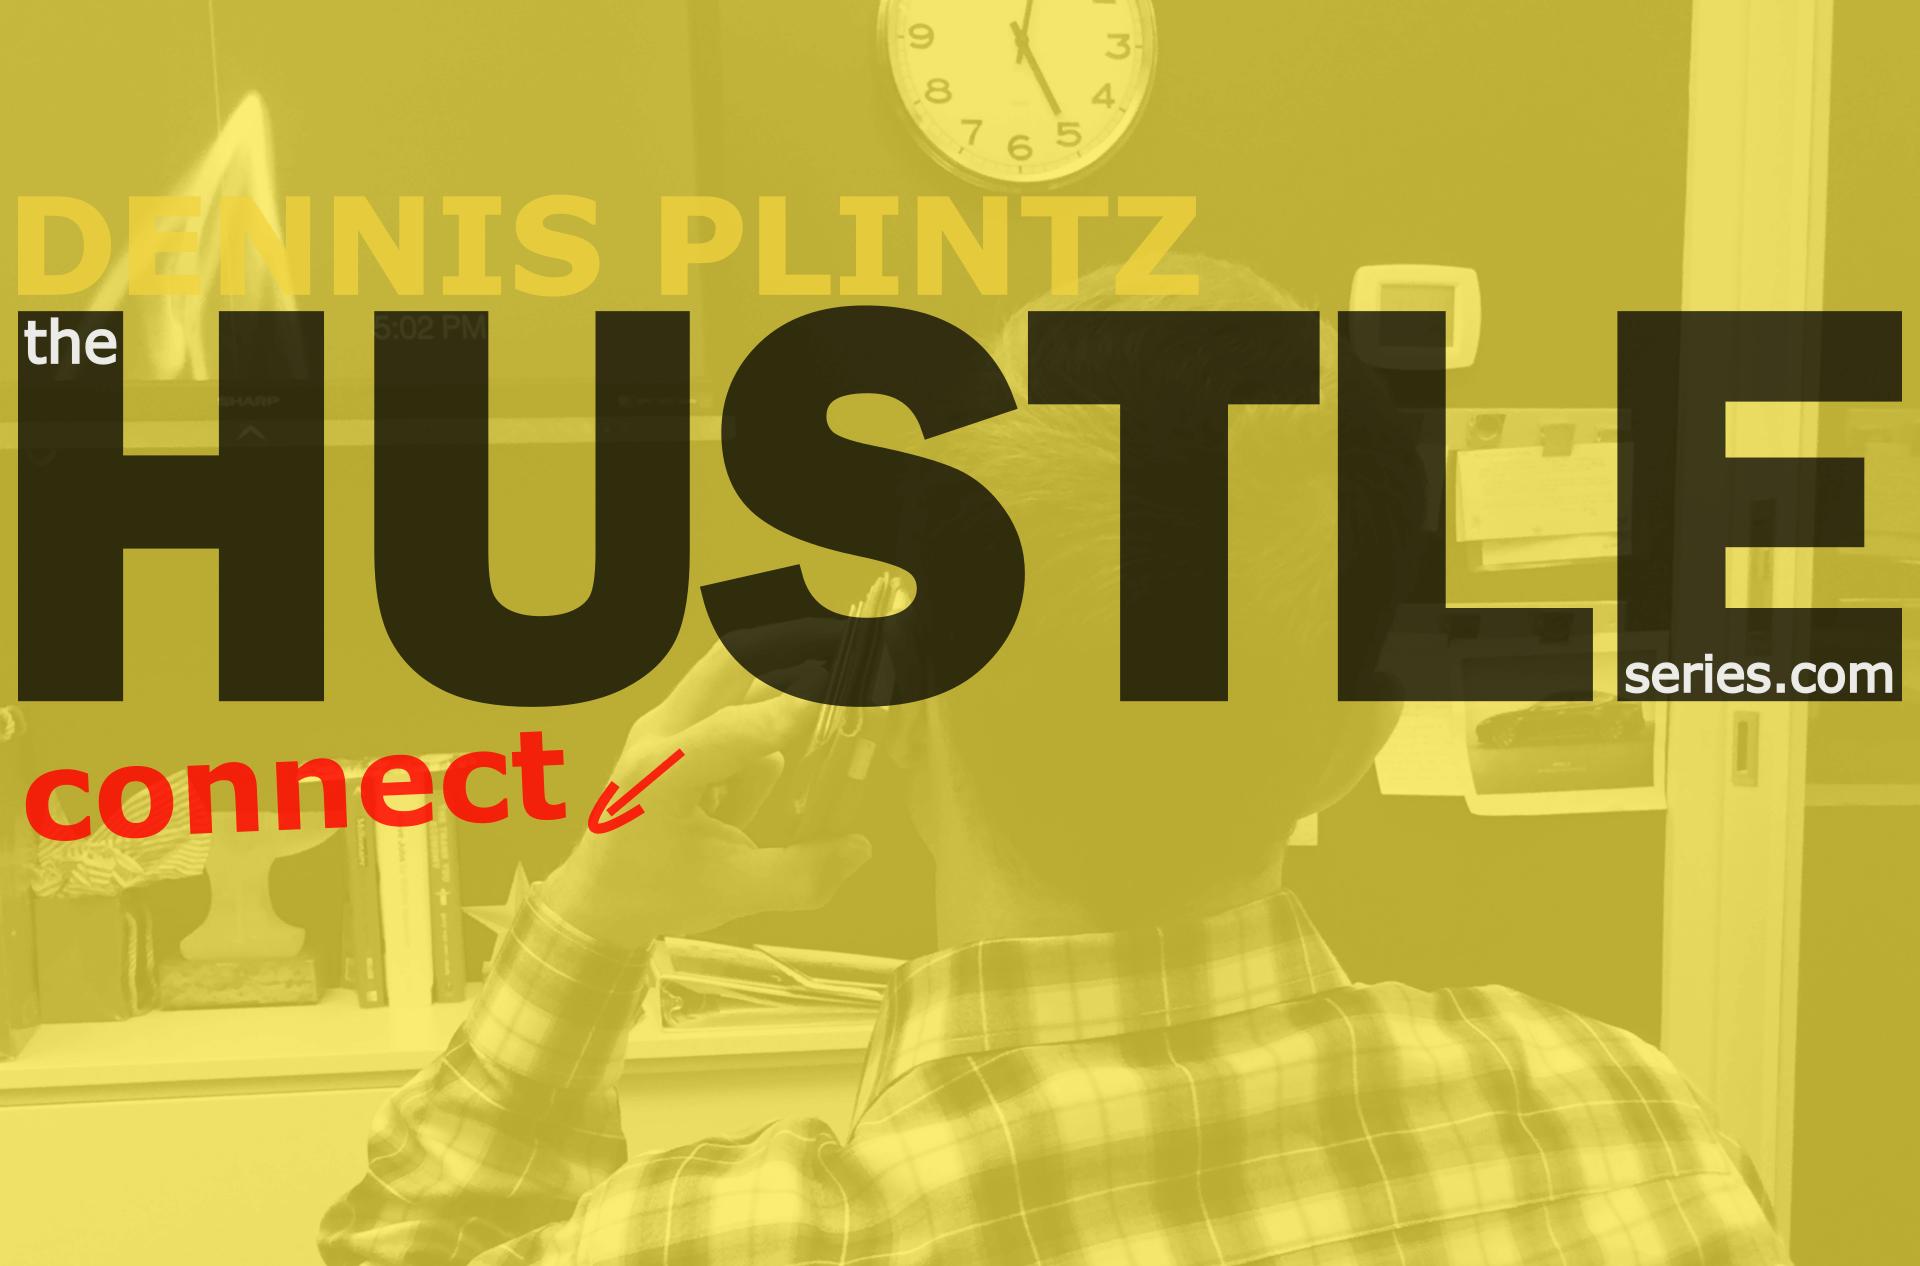 The Hustle Series by Dennis Plintz mobile slider